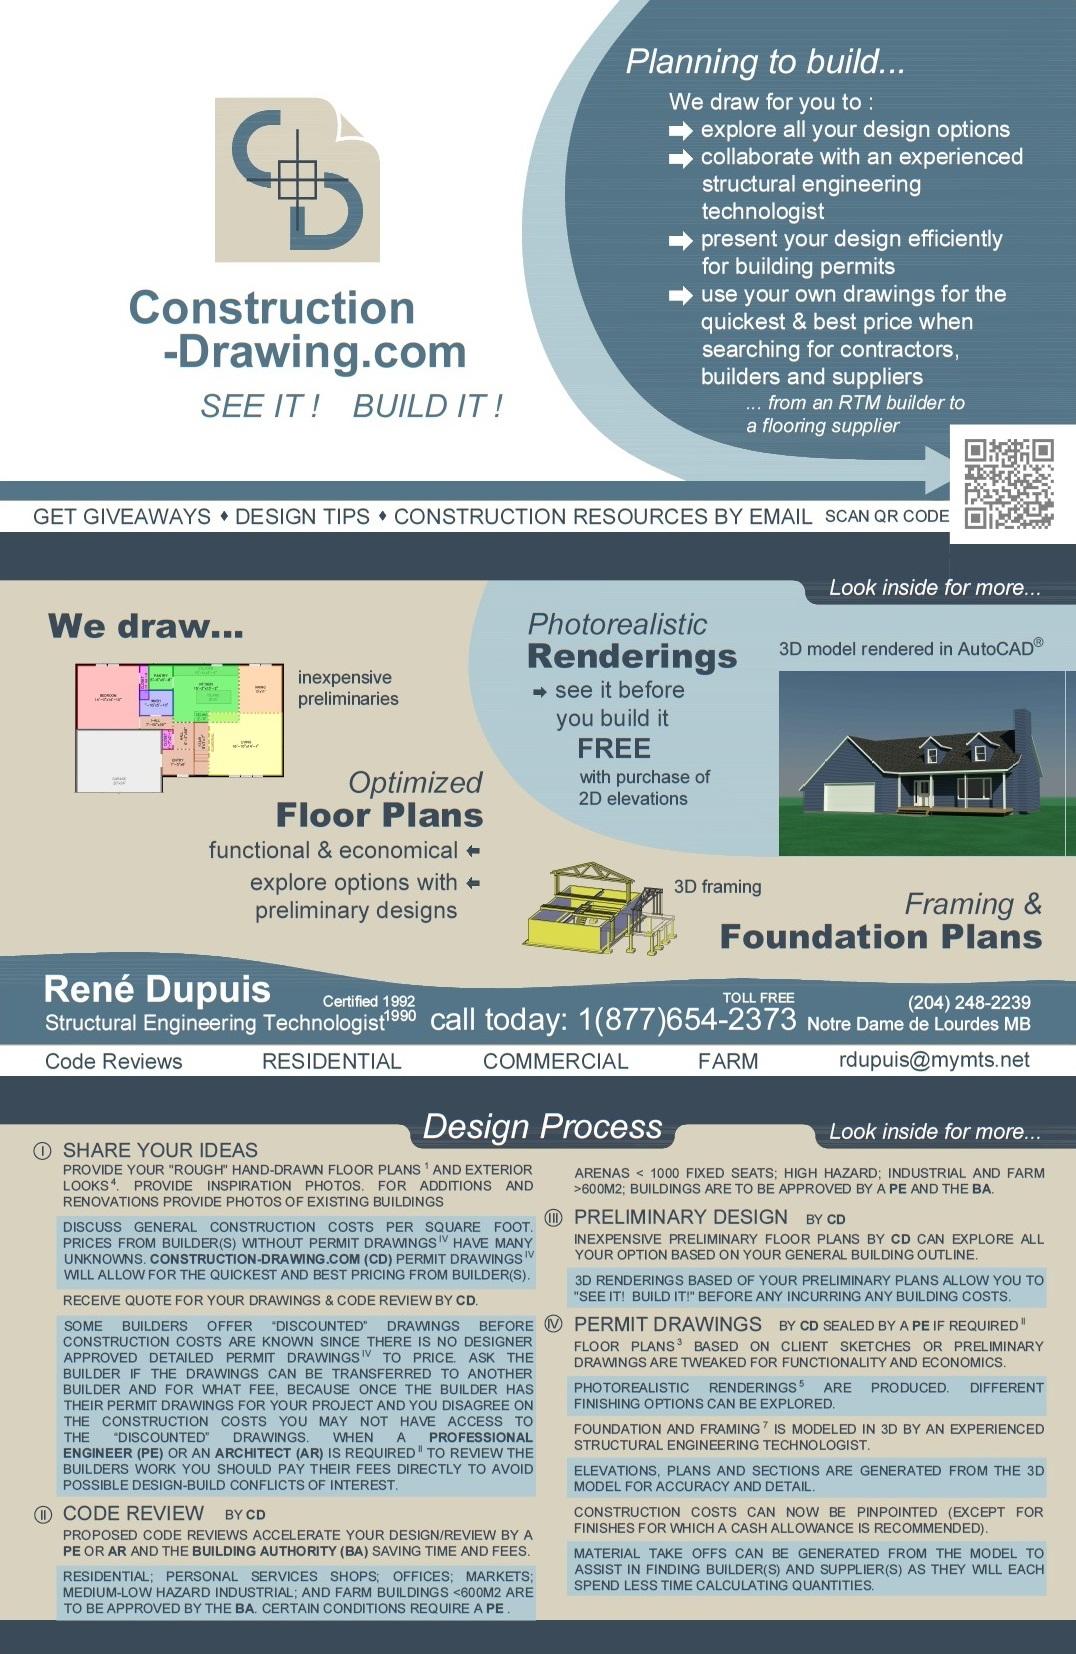 See it! Build it! • Drafting Service Manitoba (mb